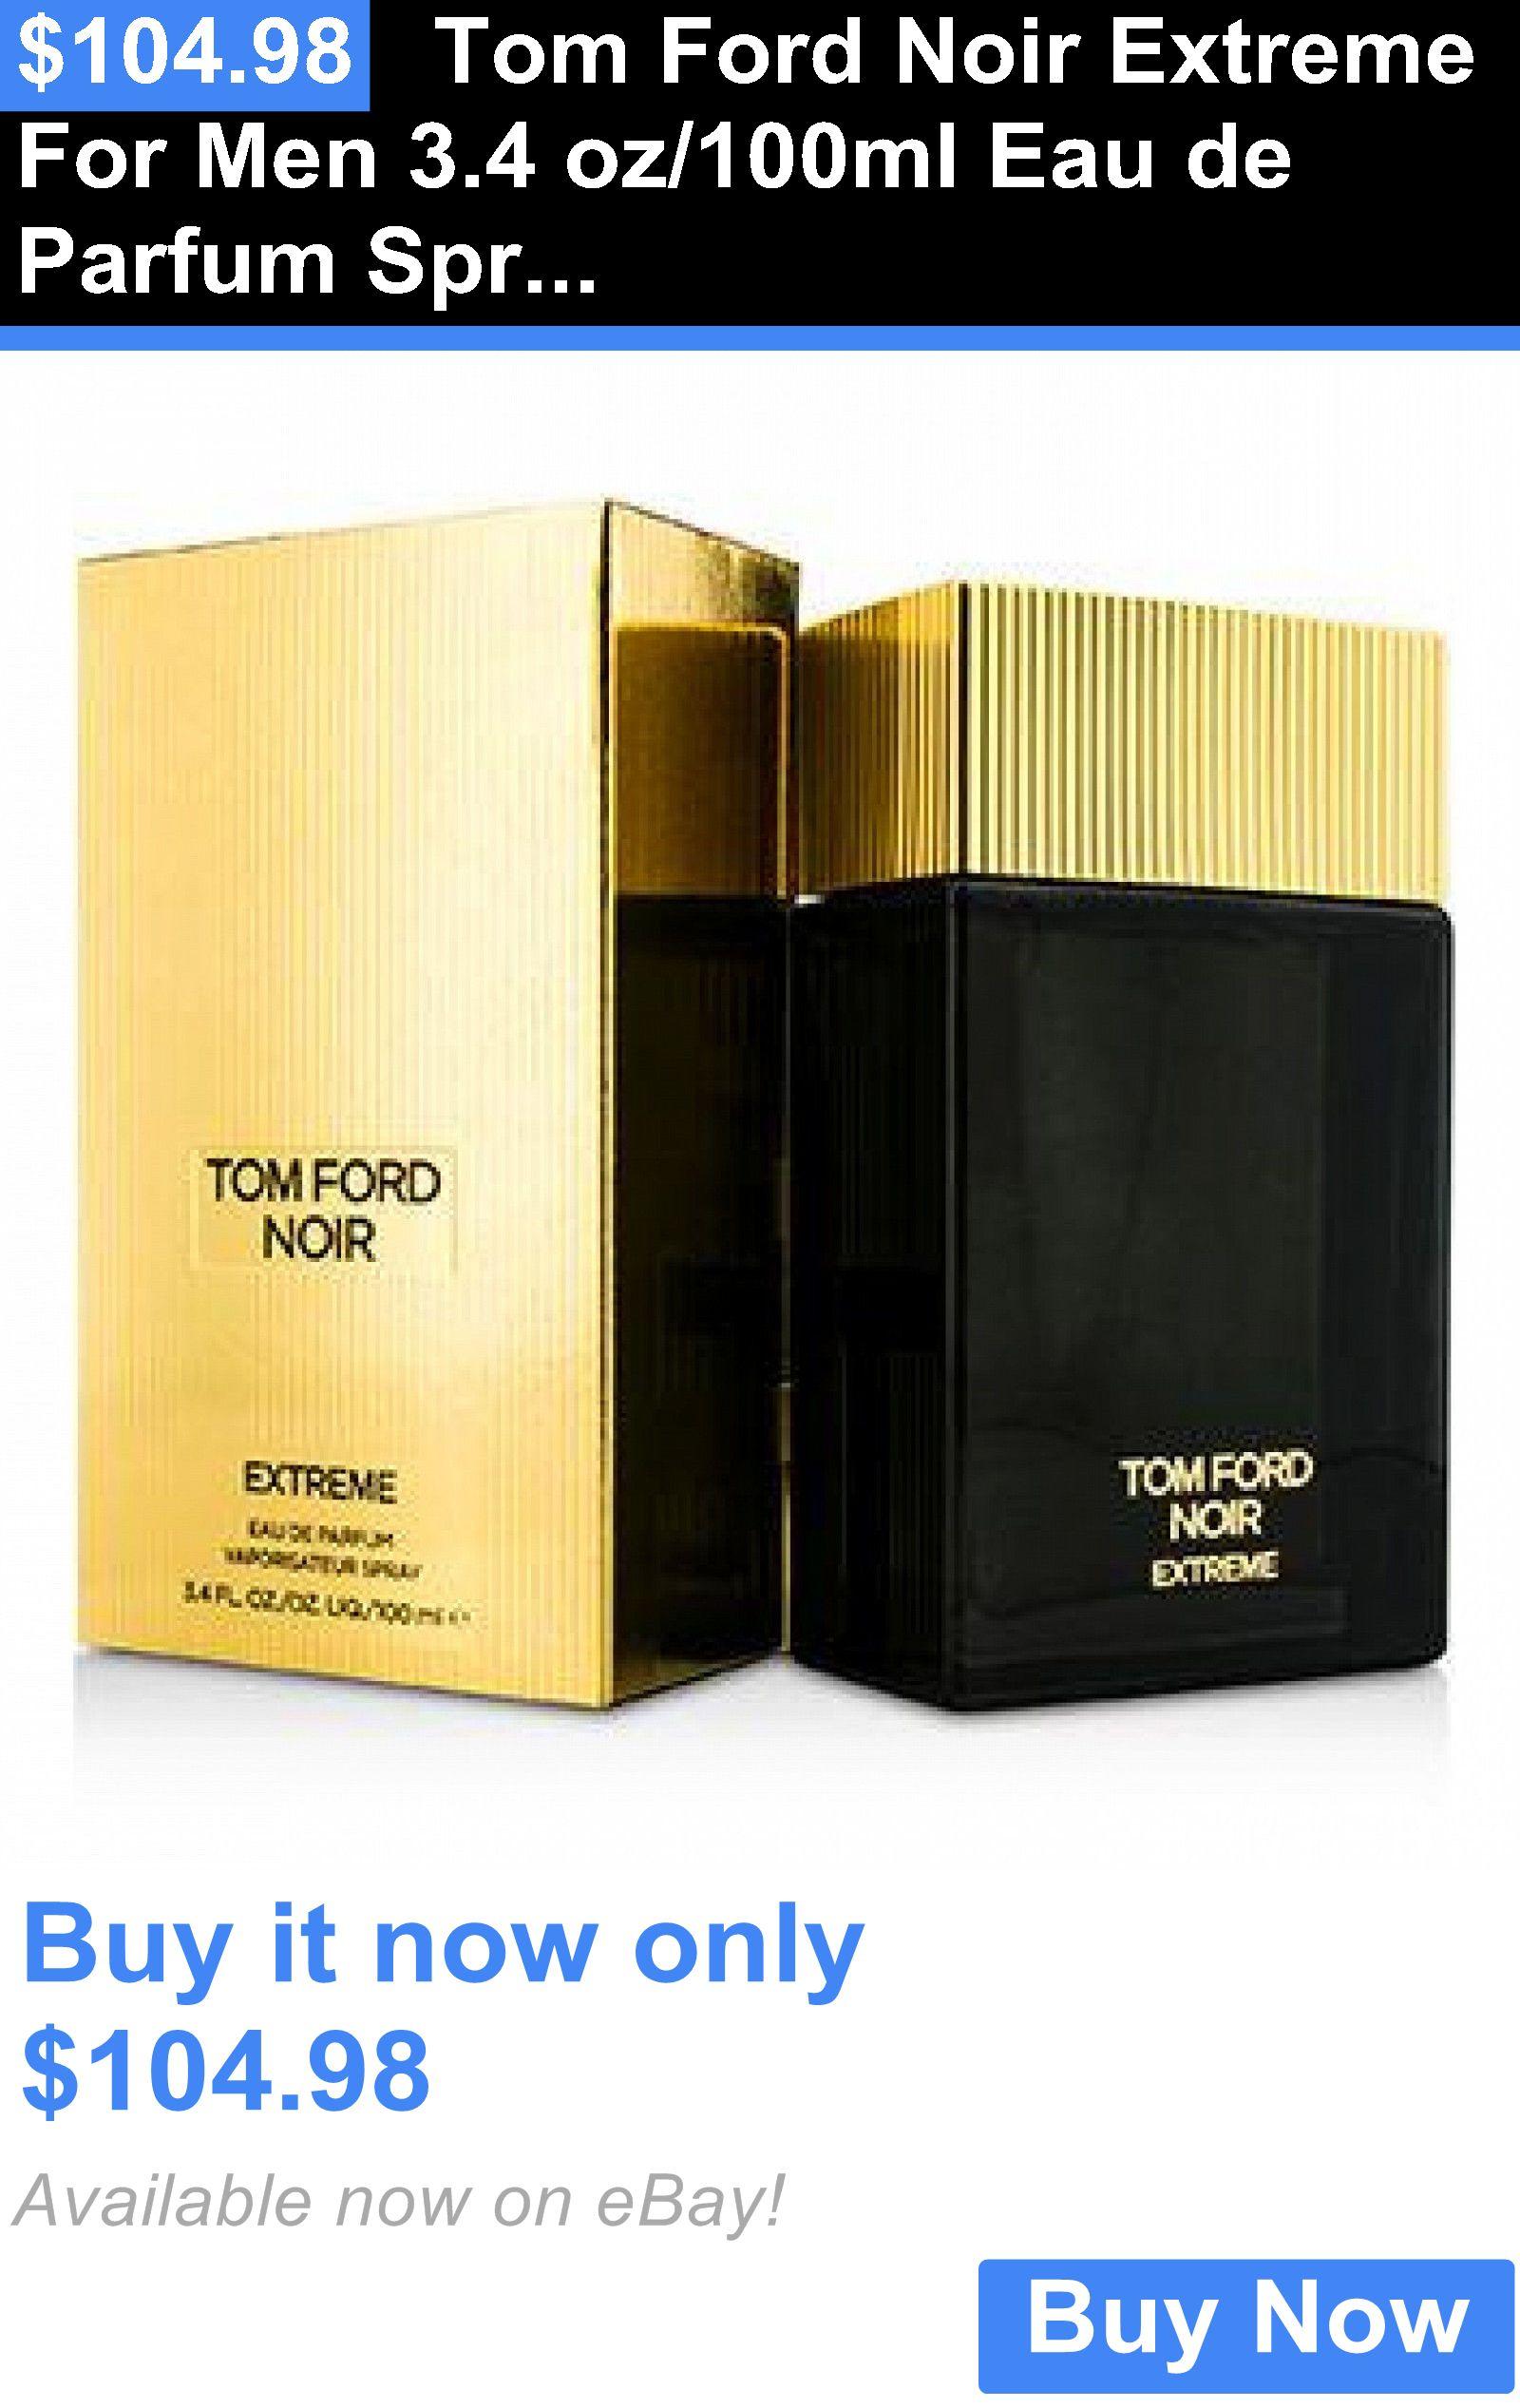 Men Fragrance Tom Ford Noir Extreme For Men 3 4 Oz 100ml Eau De Parfum Spray New In Box Sealed Buy It Now Only 104 98